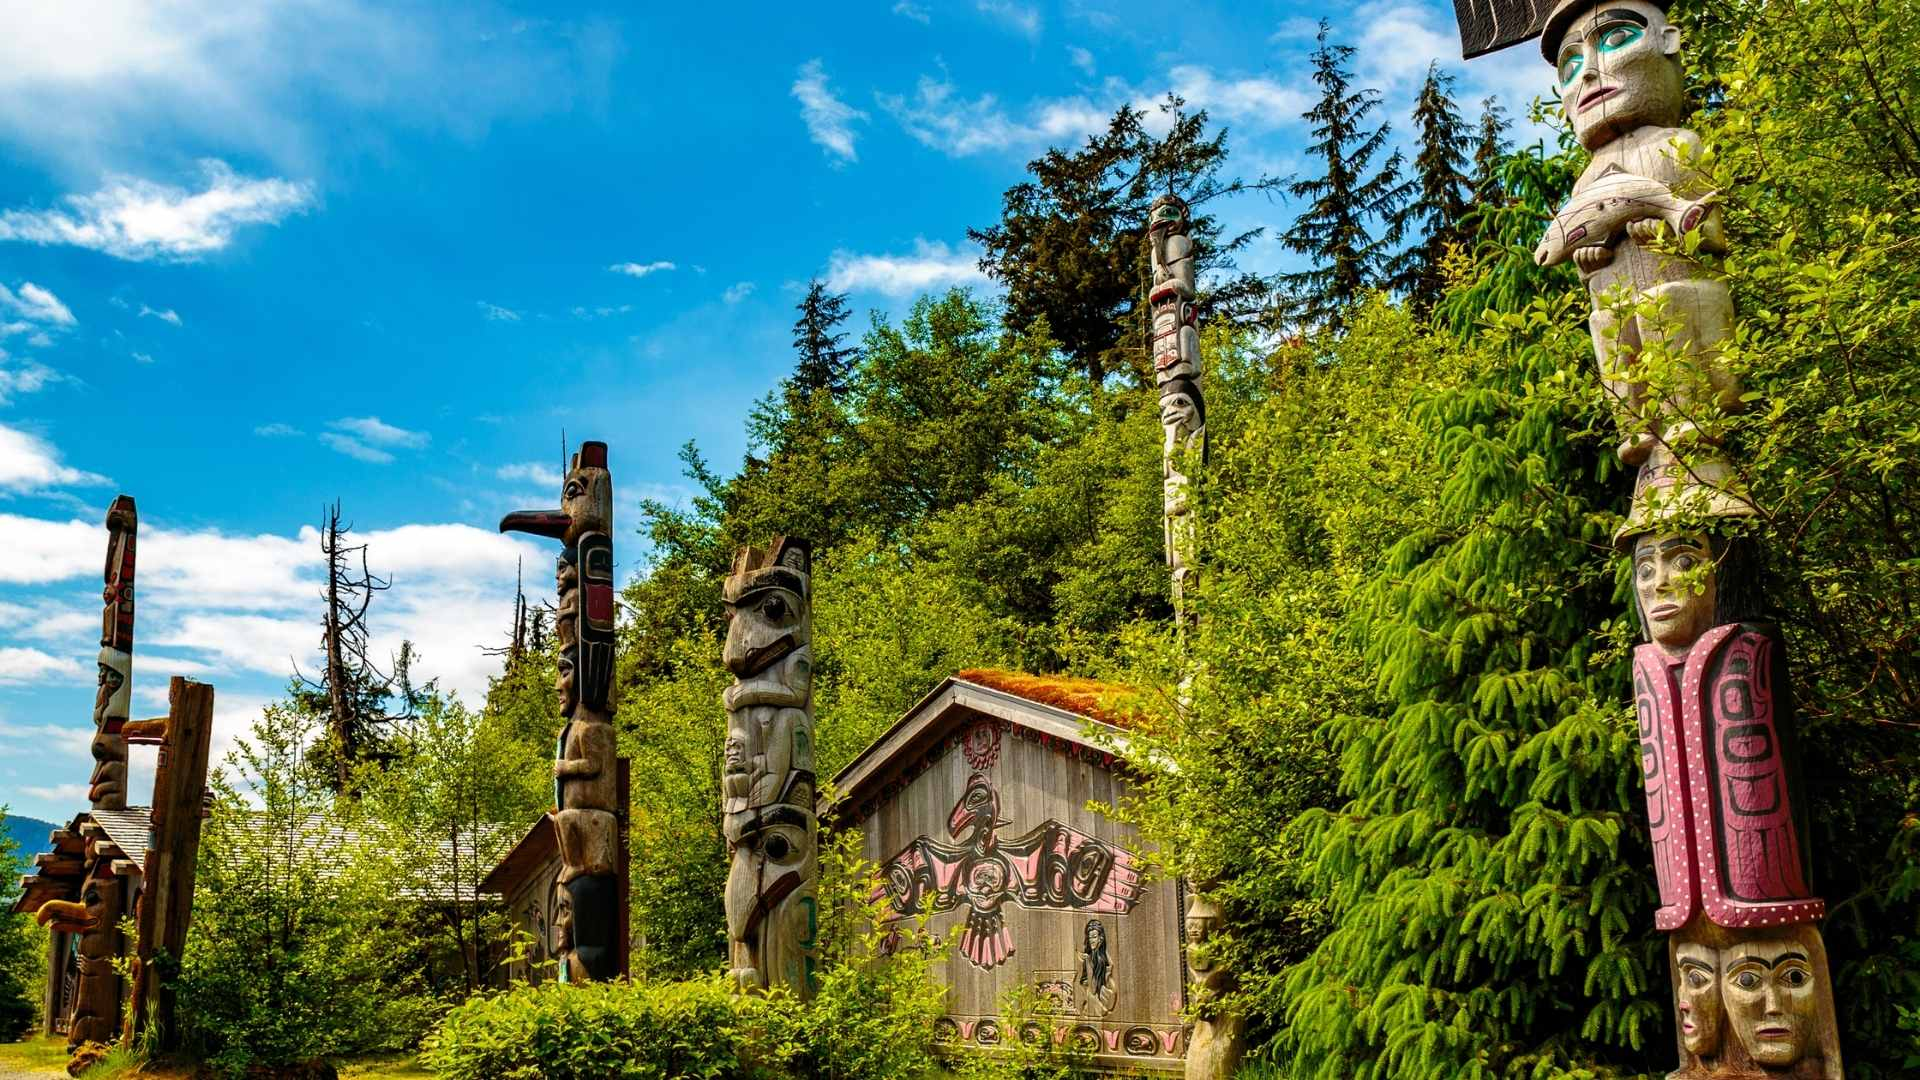 Ketchikan Totem Poles